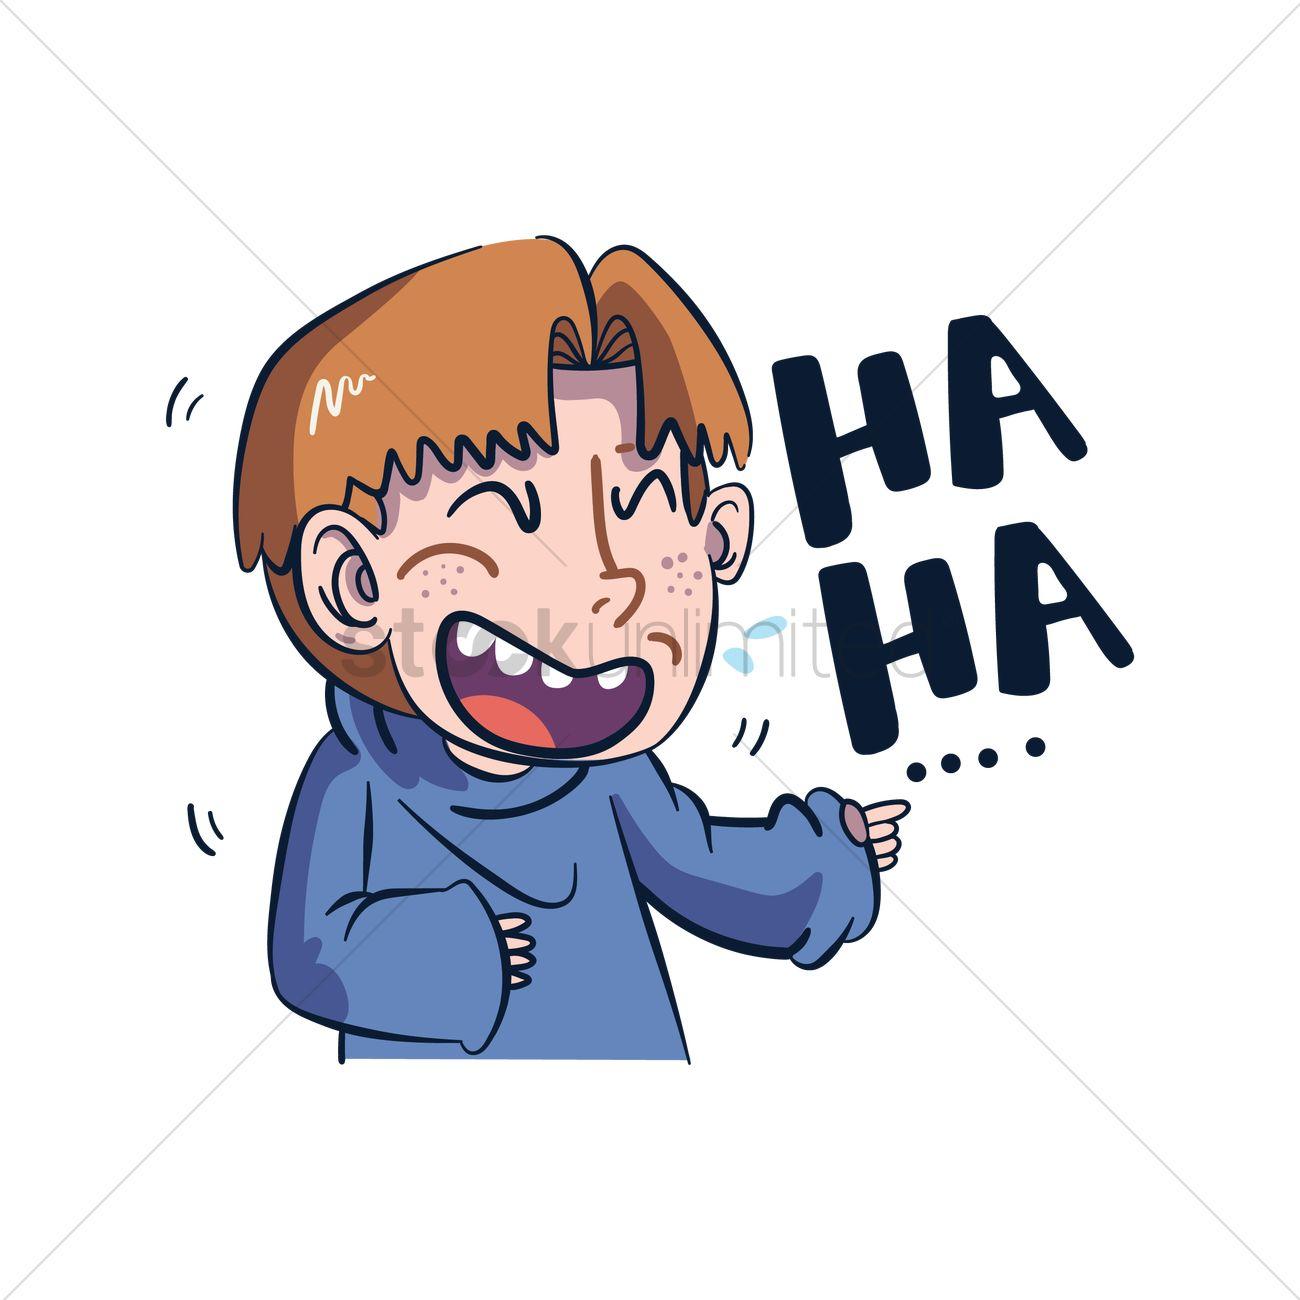 Cartoon Characters Laughing : Cartoon character laughing vector image